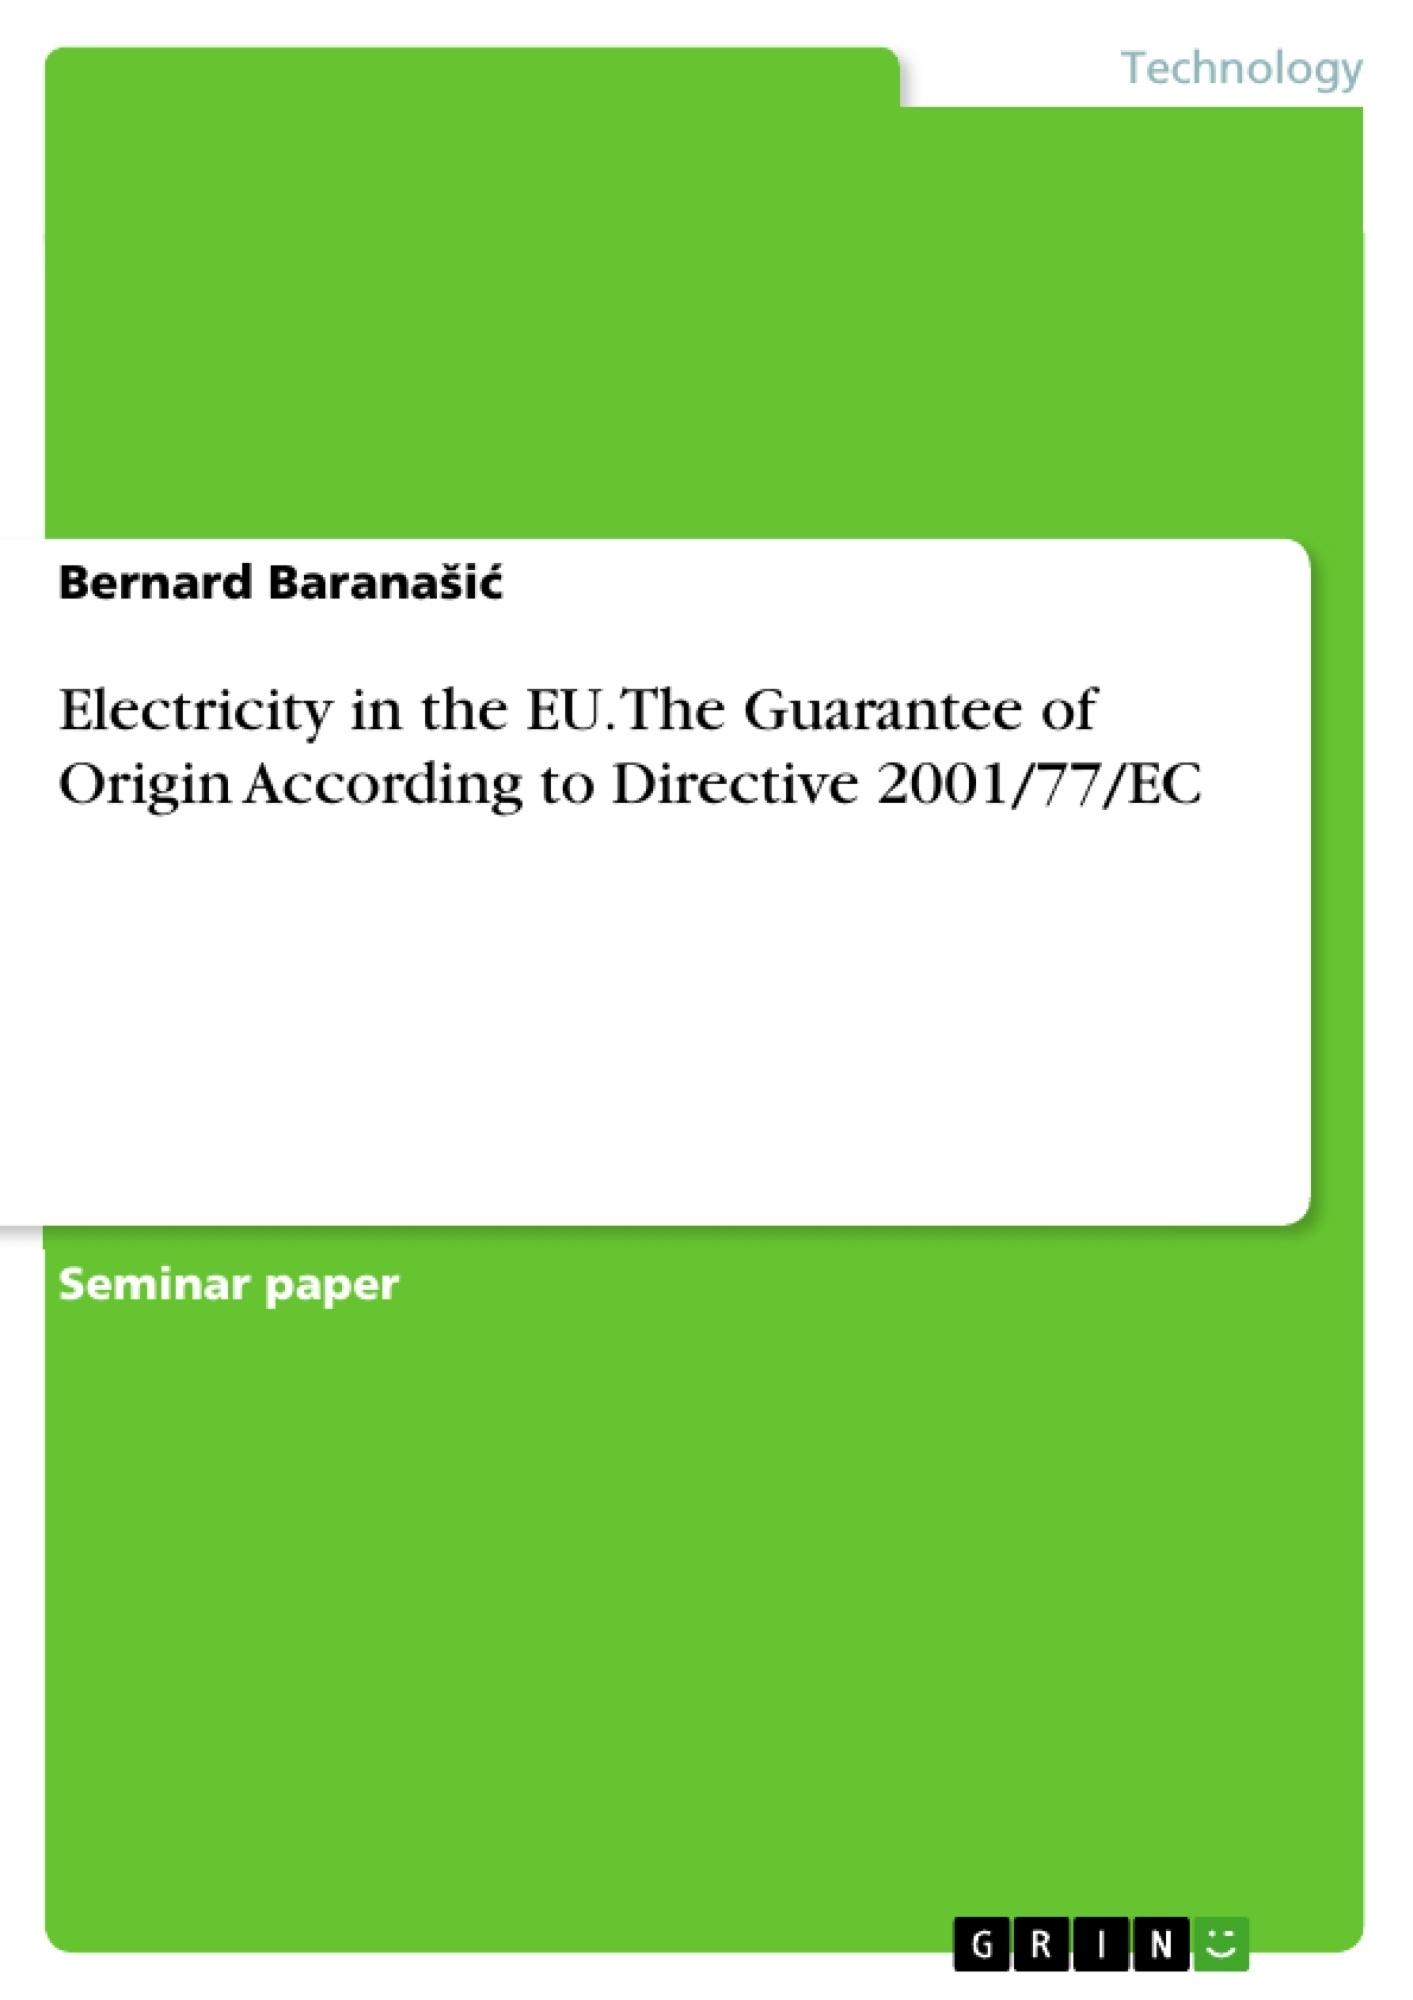 Title: Electricity in the EU. The Guarantee of Origin According to Directive 2001/77/EC